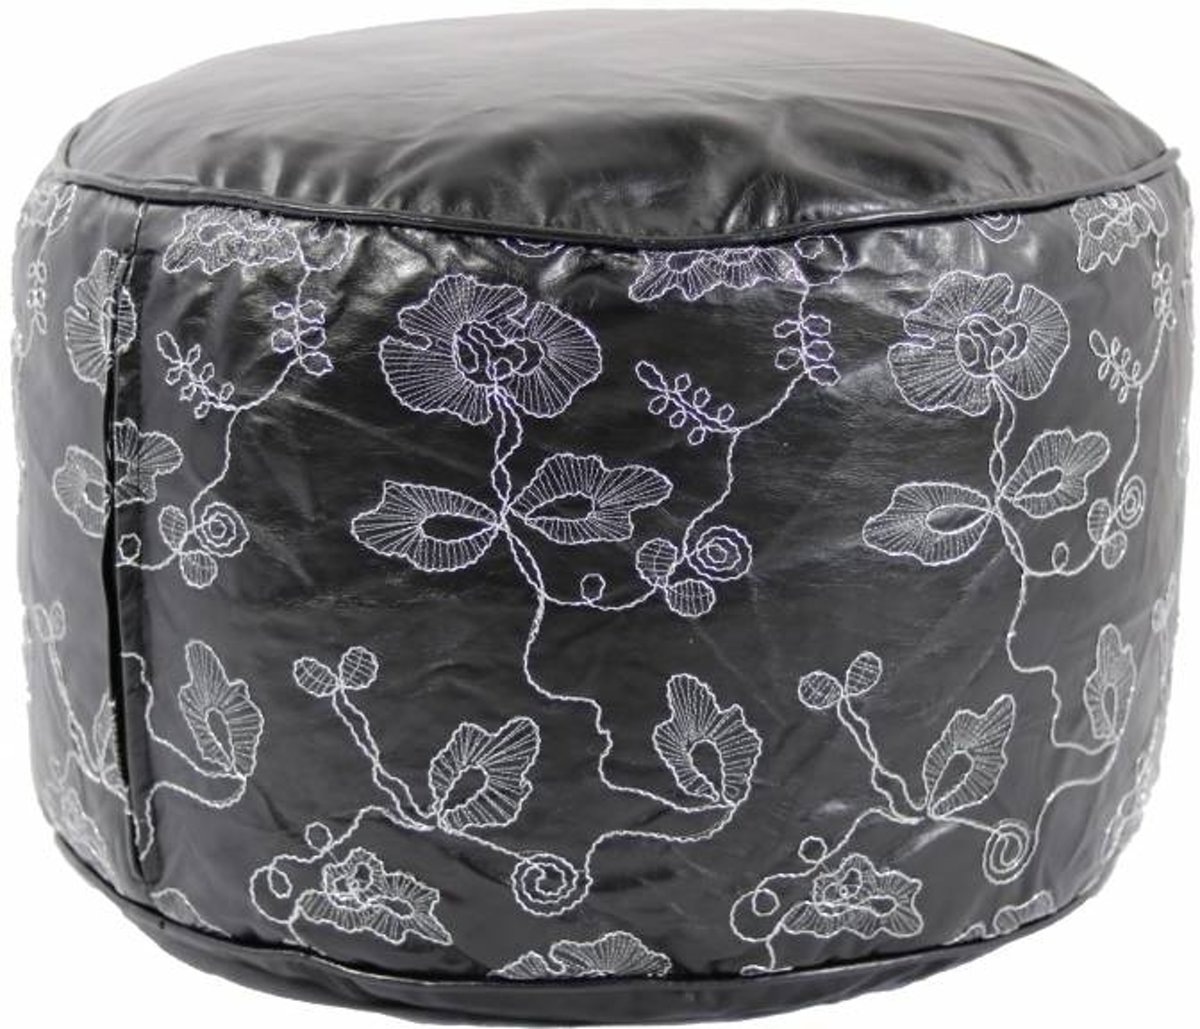 Poef Leather Look Embroidery Zwart/Wit kopen